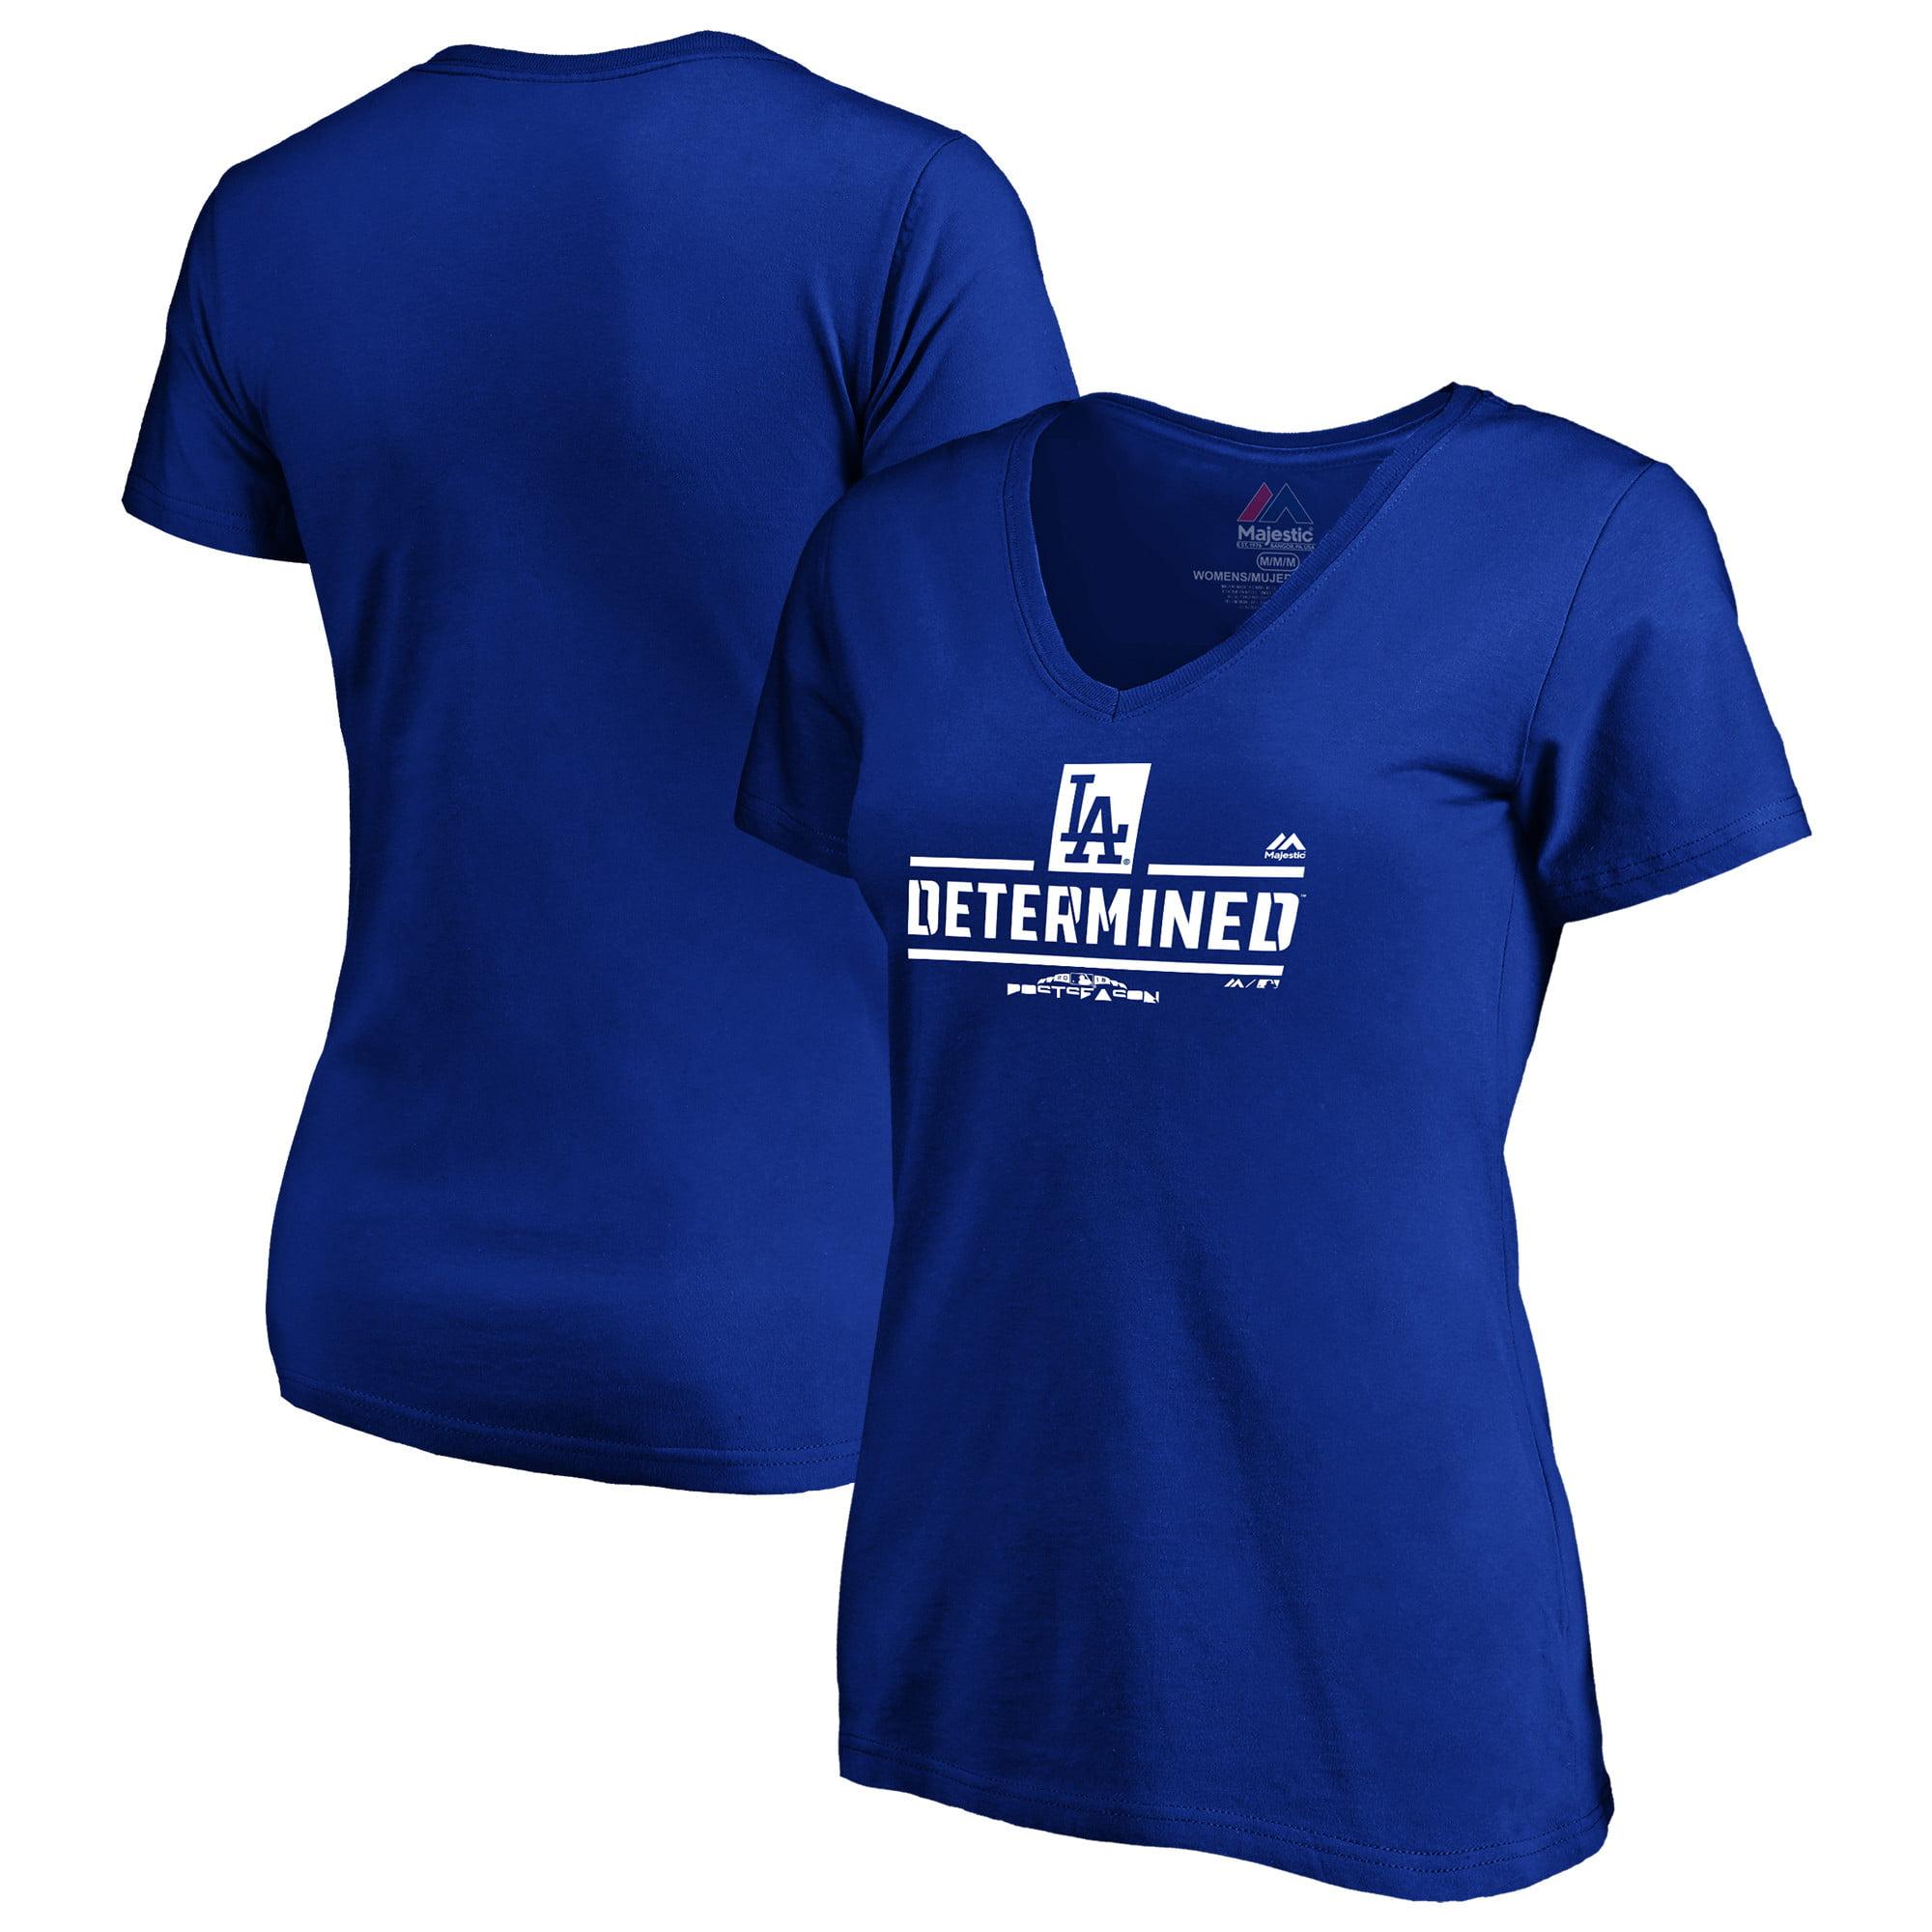 Los Angeles Dodgers Majestic Women's 2018 Postseason Authentic Collection T-Shirt - Royal